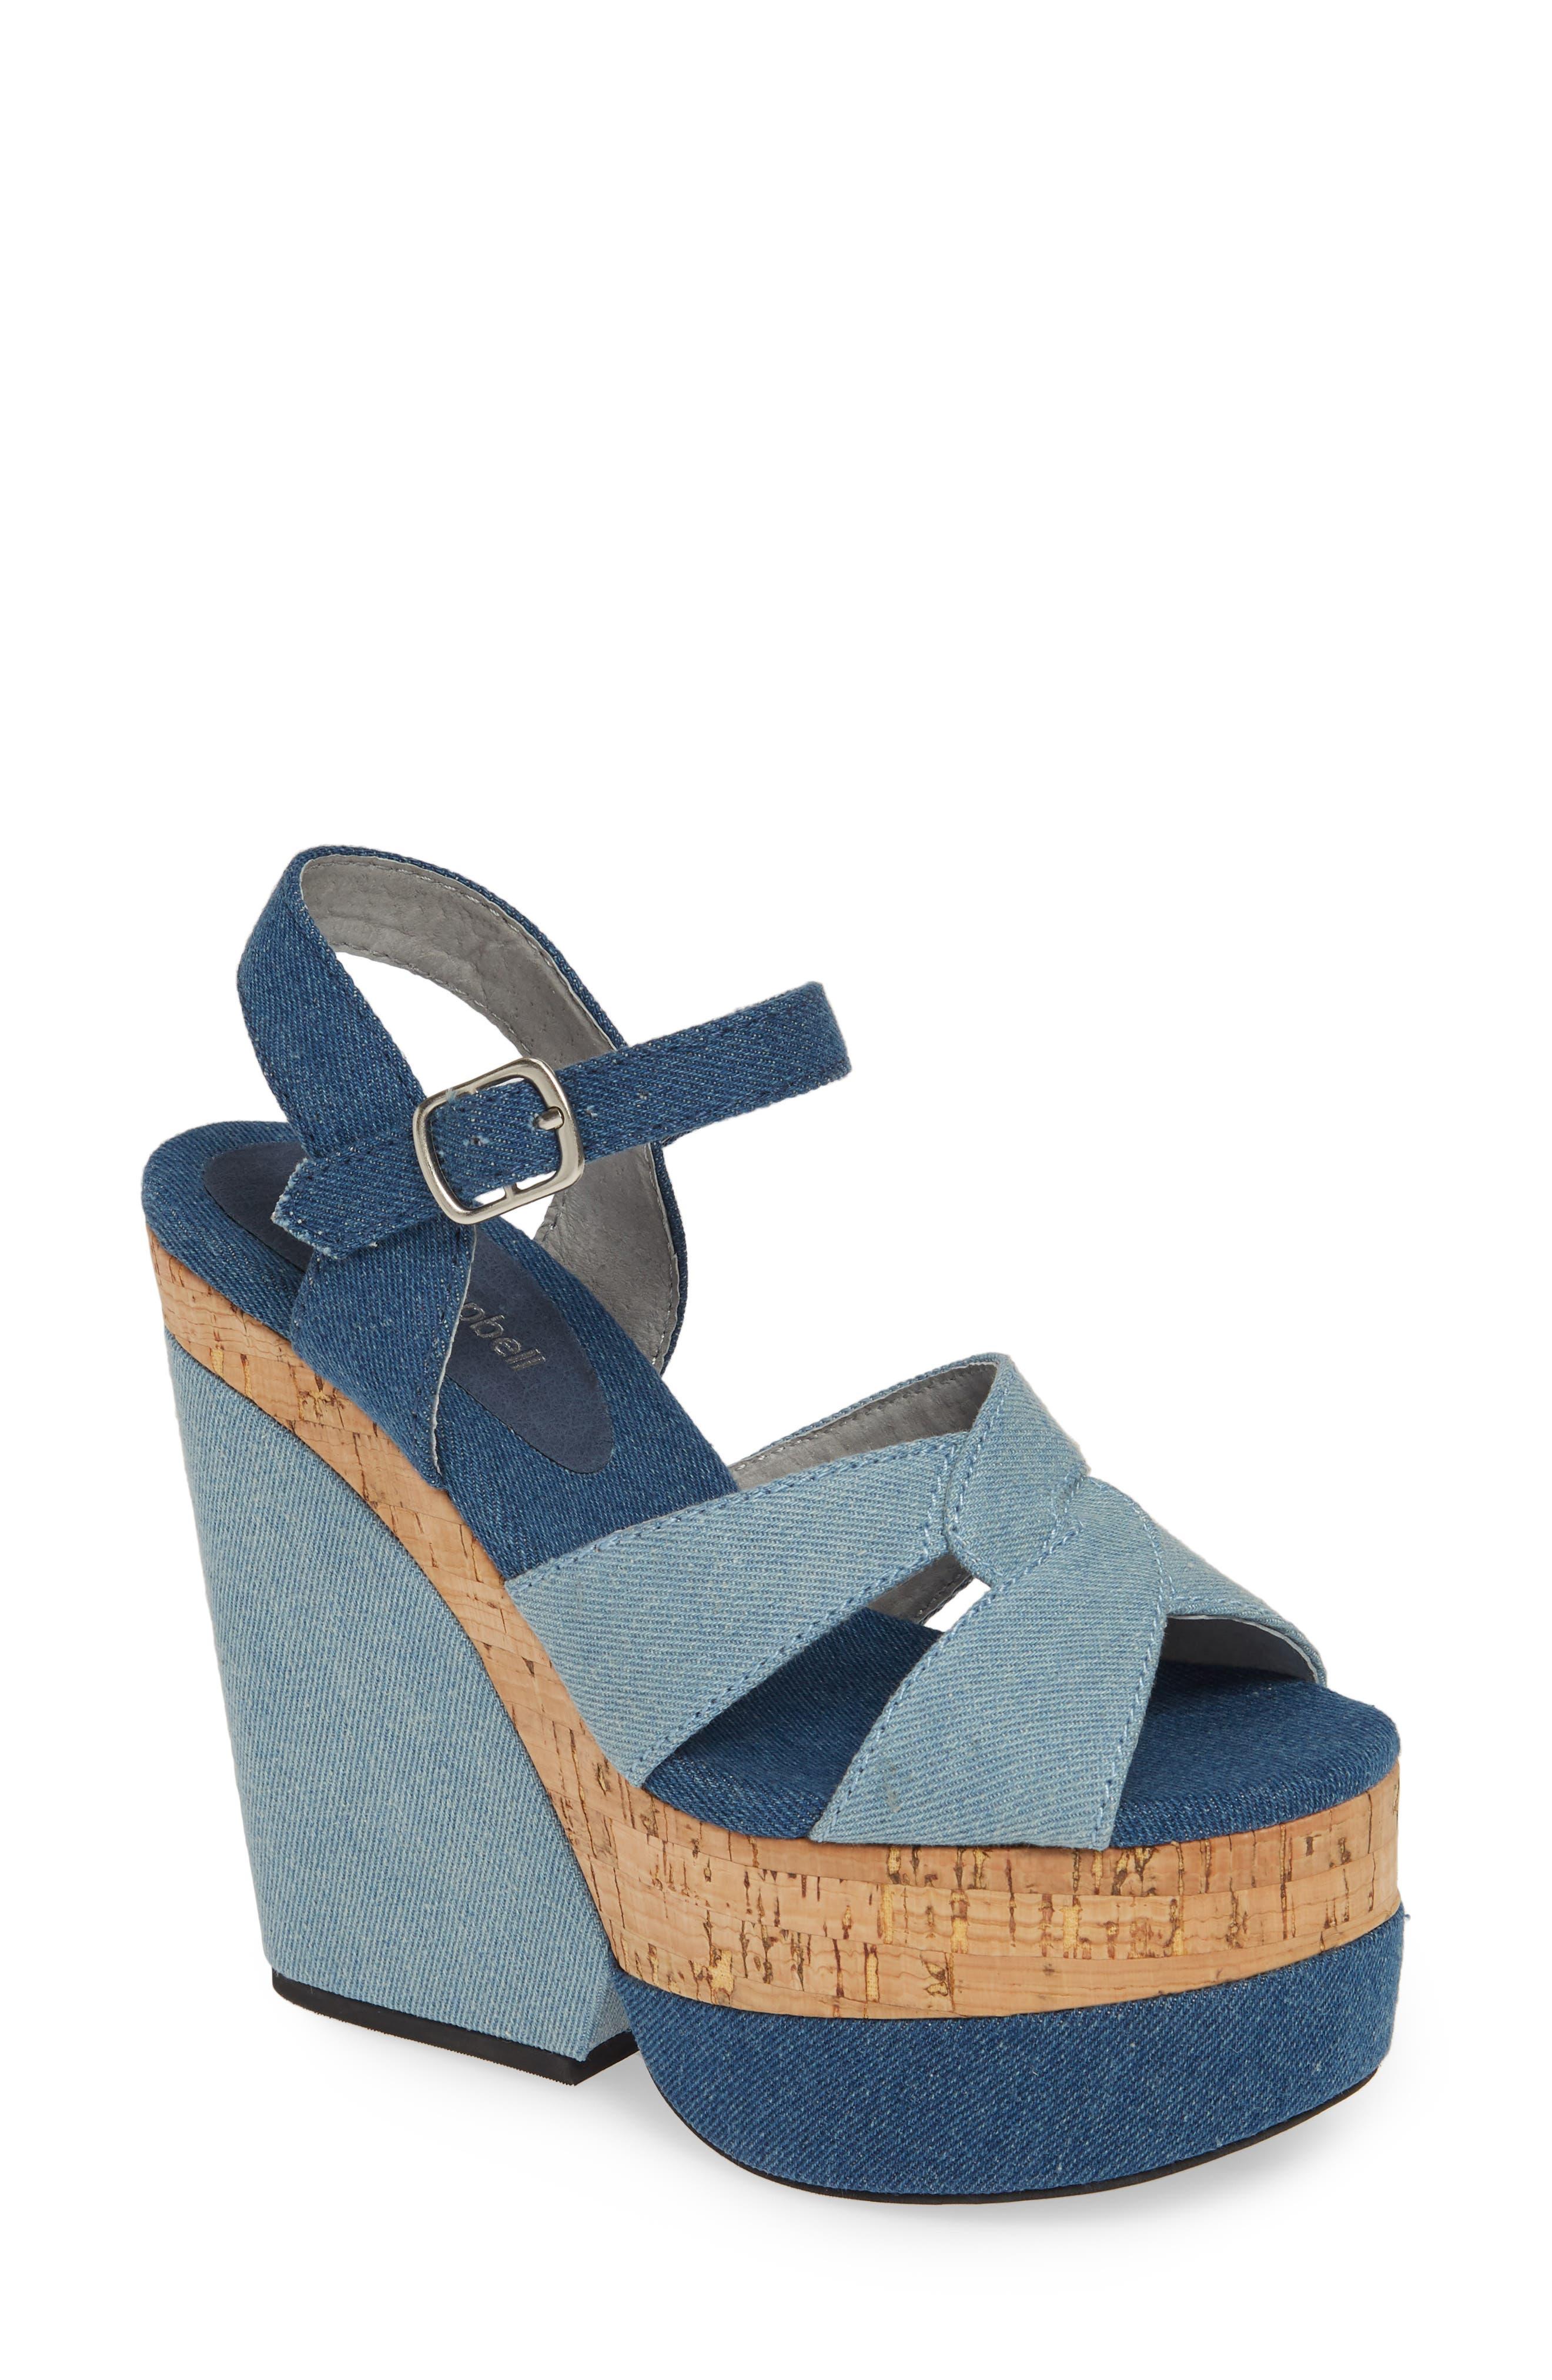 JEFFREY CAMPBELL Wedge Platform Sandal, Main, color, BLUE DENIM COMBO/ CORK